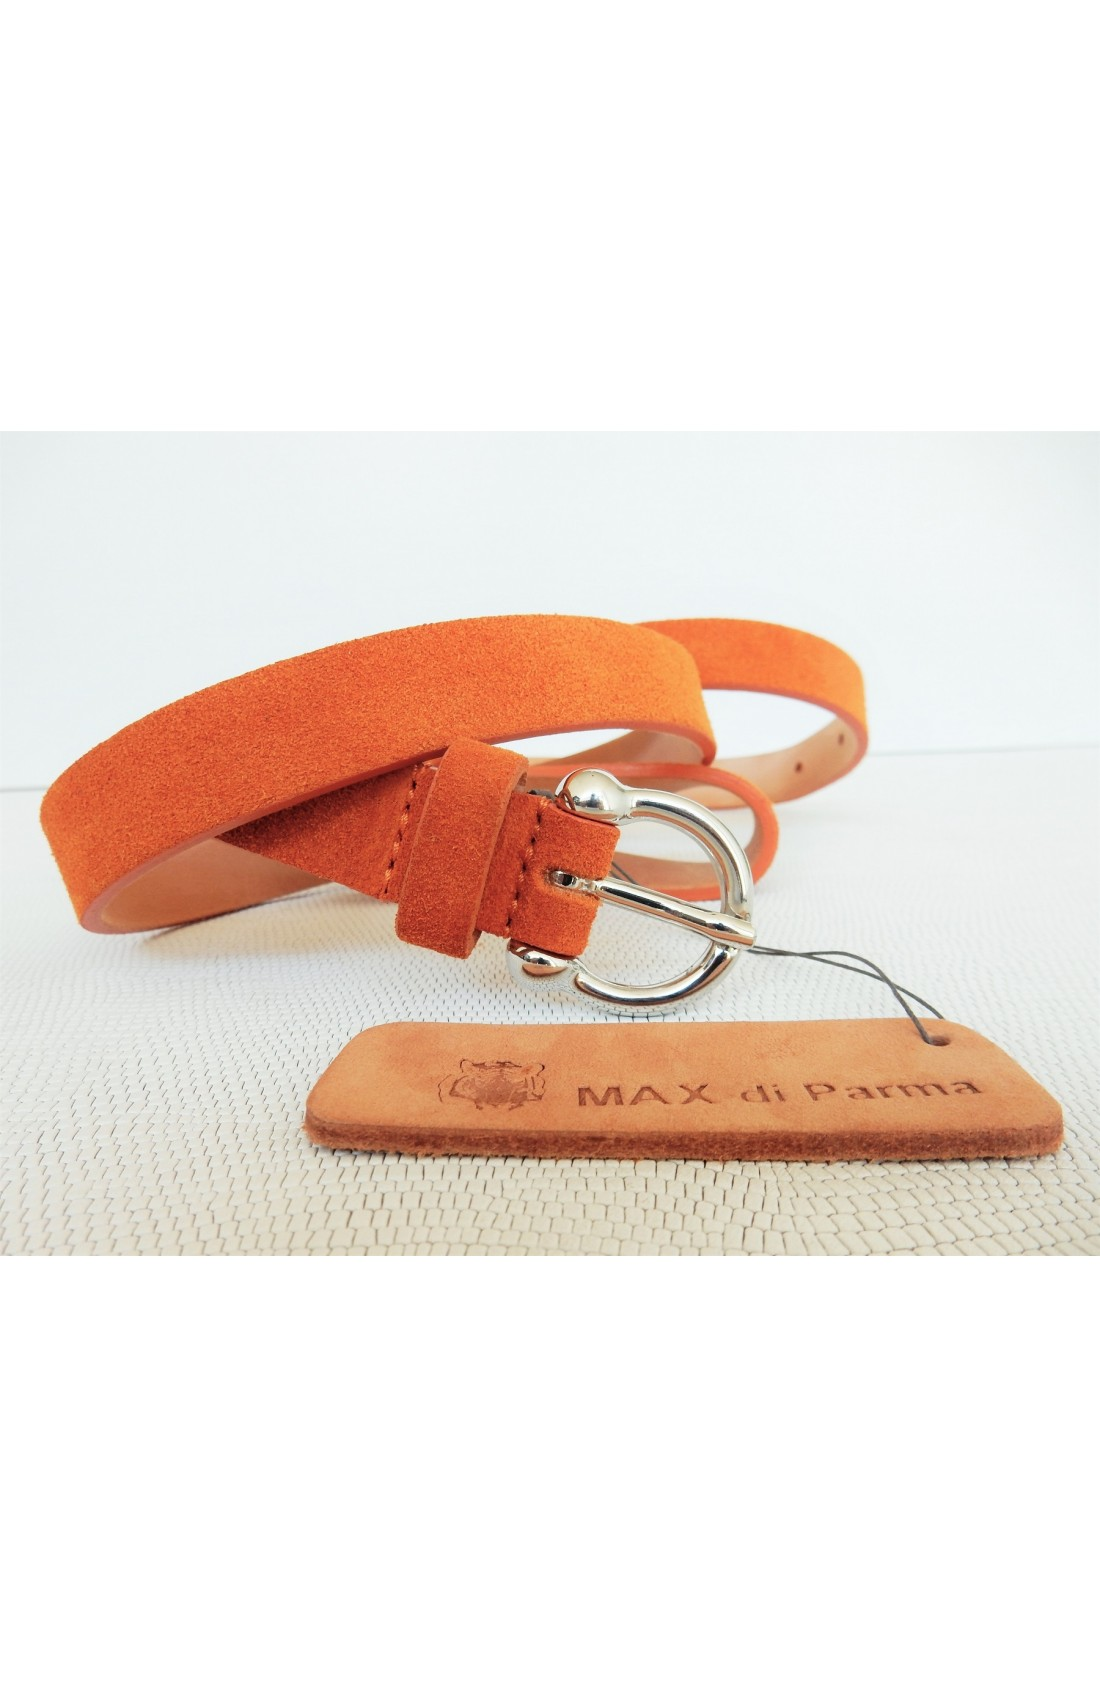 art. 601 SCAMOSCIATO mm.20 var.81 arancio mattone fibbia L 70 mm.20 nikel free (2)